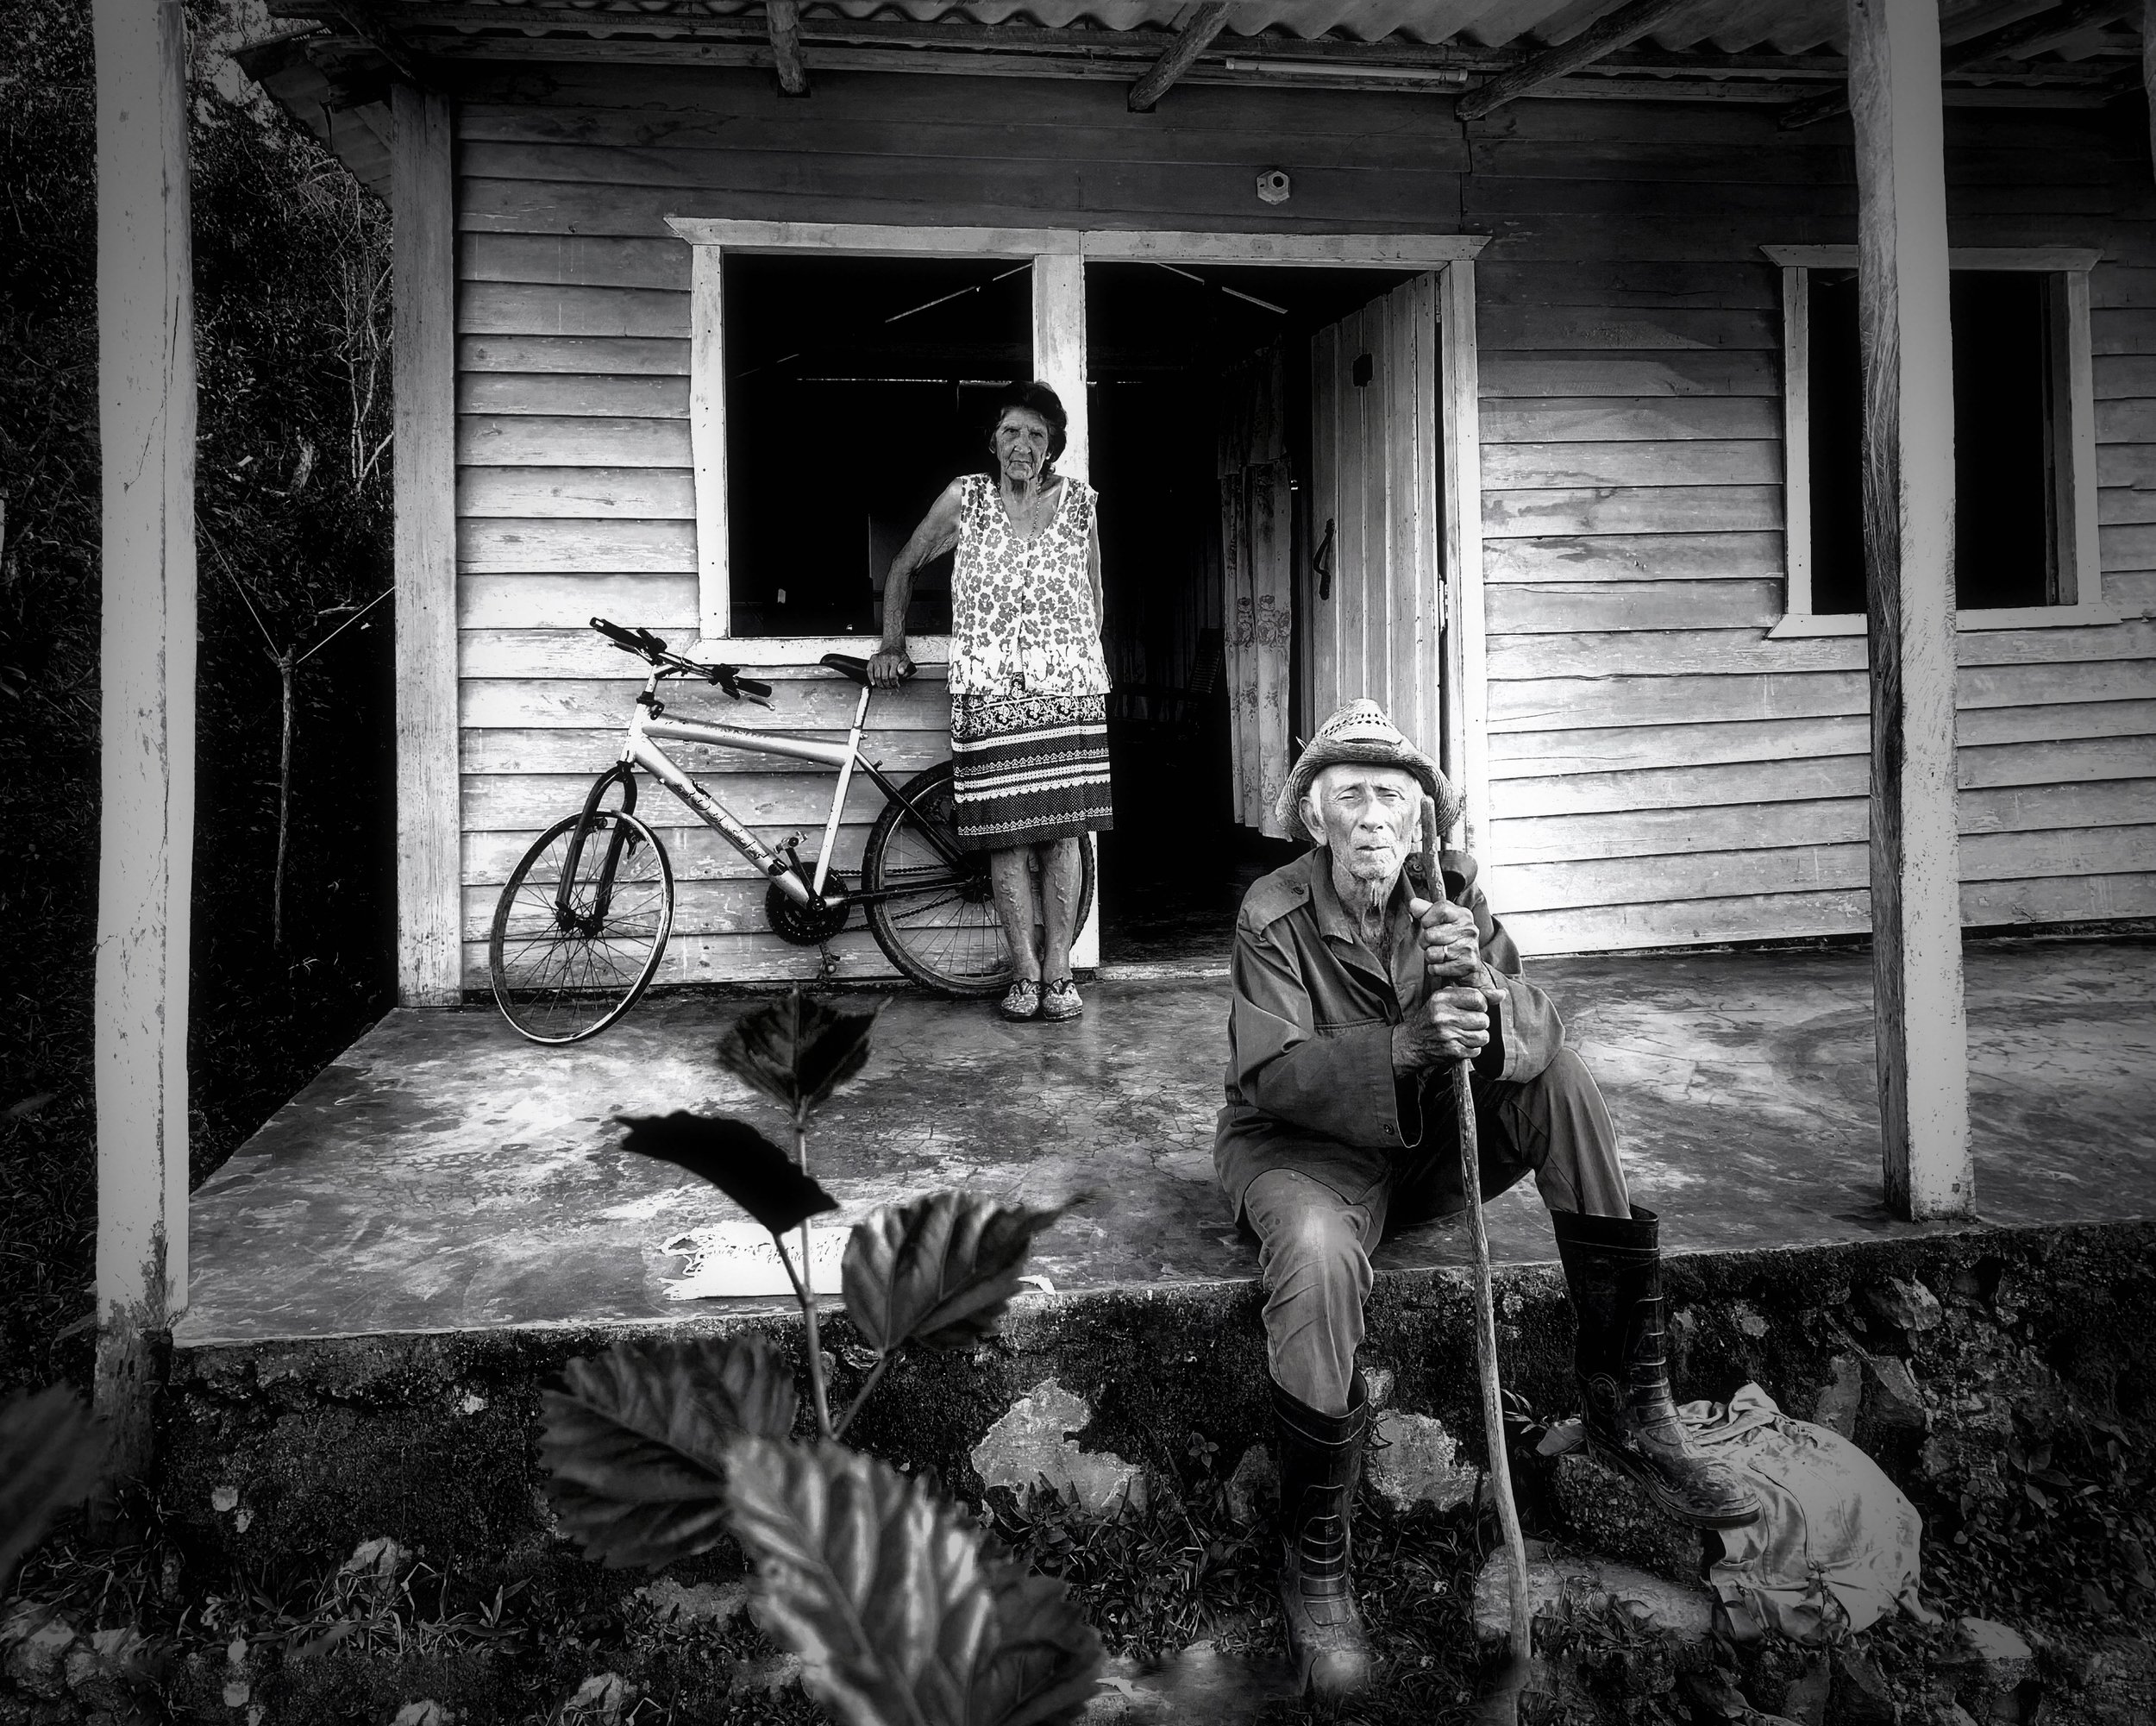 Farm Family, Vinales by Rad Drew